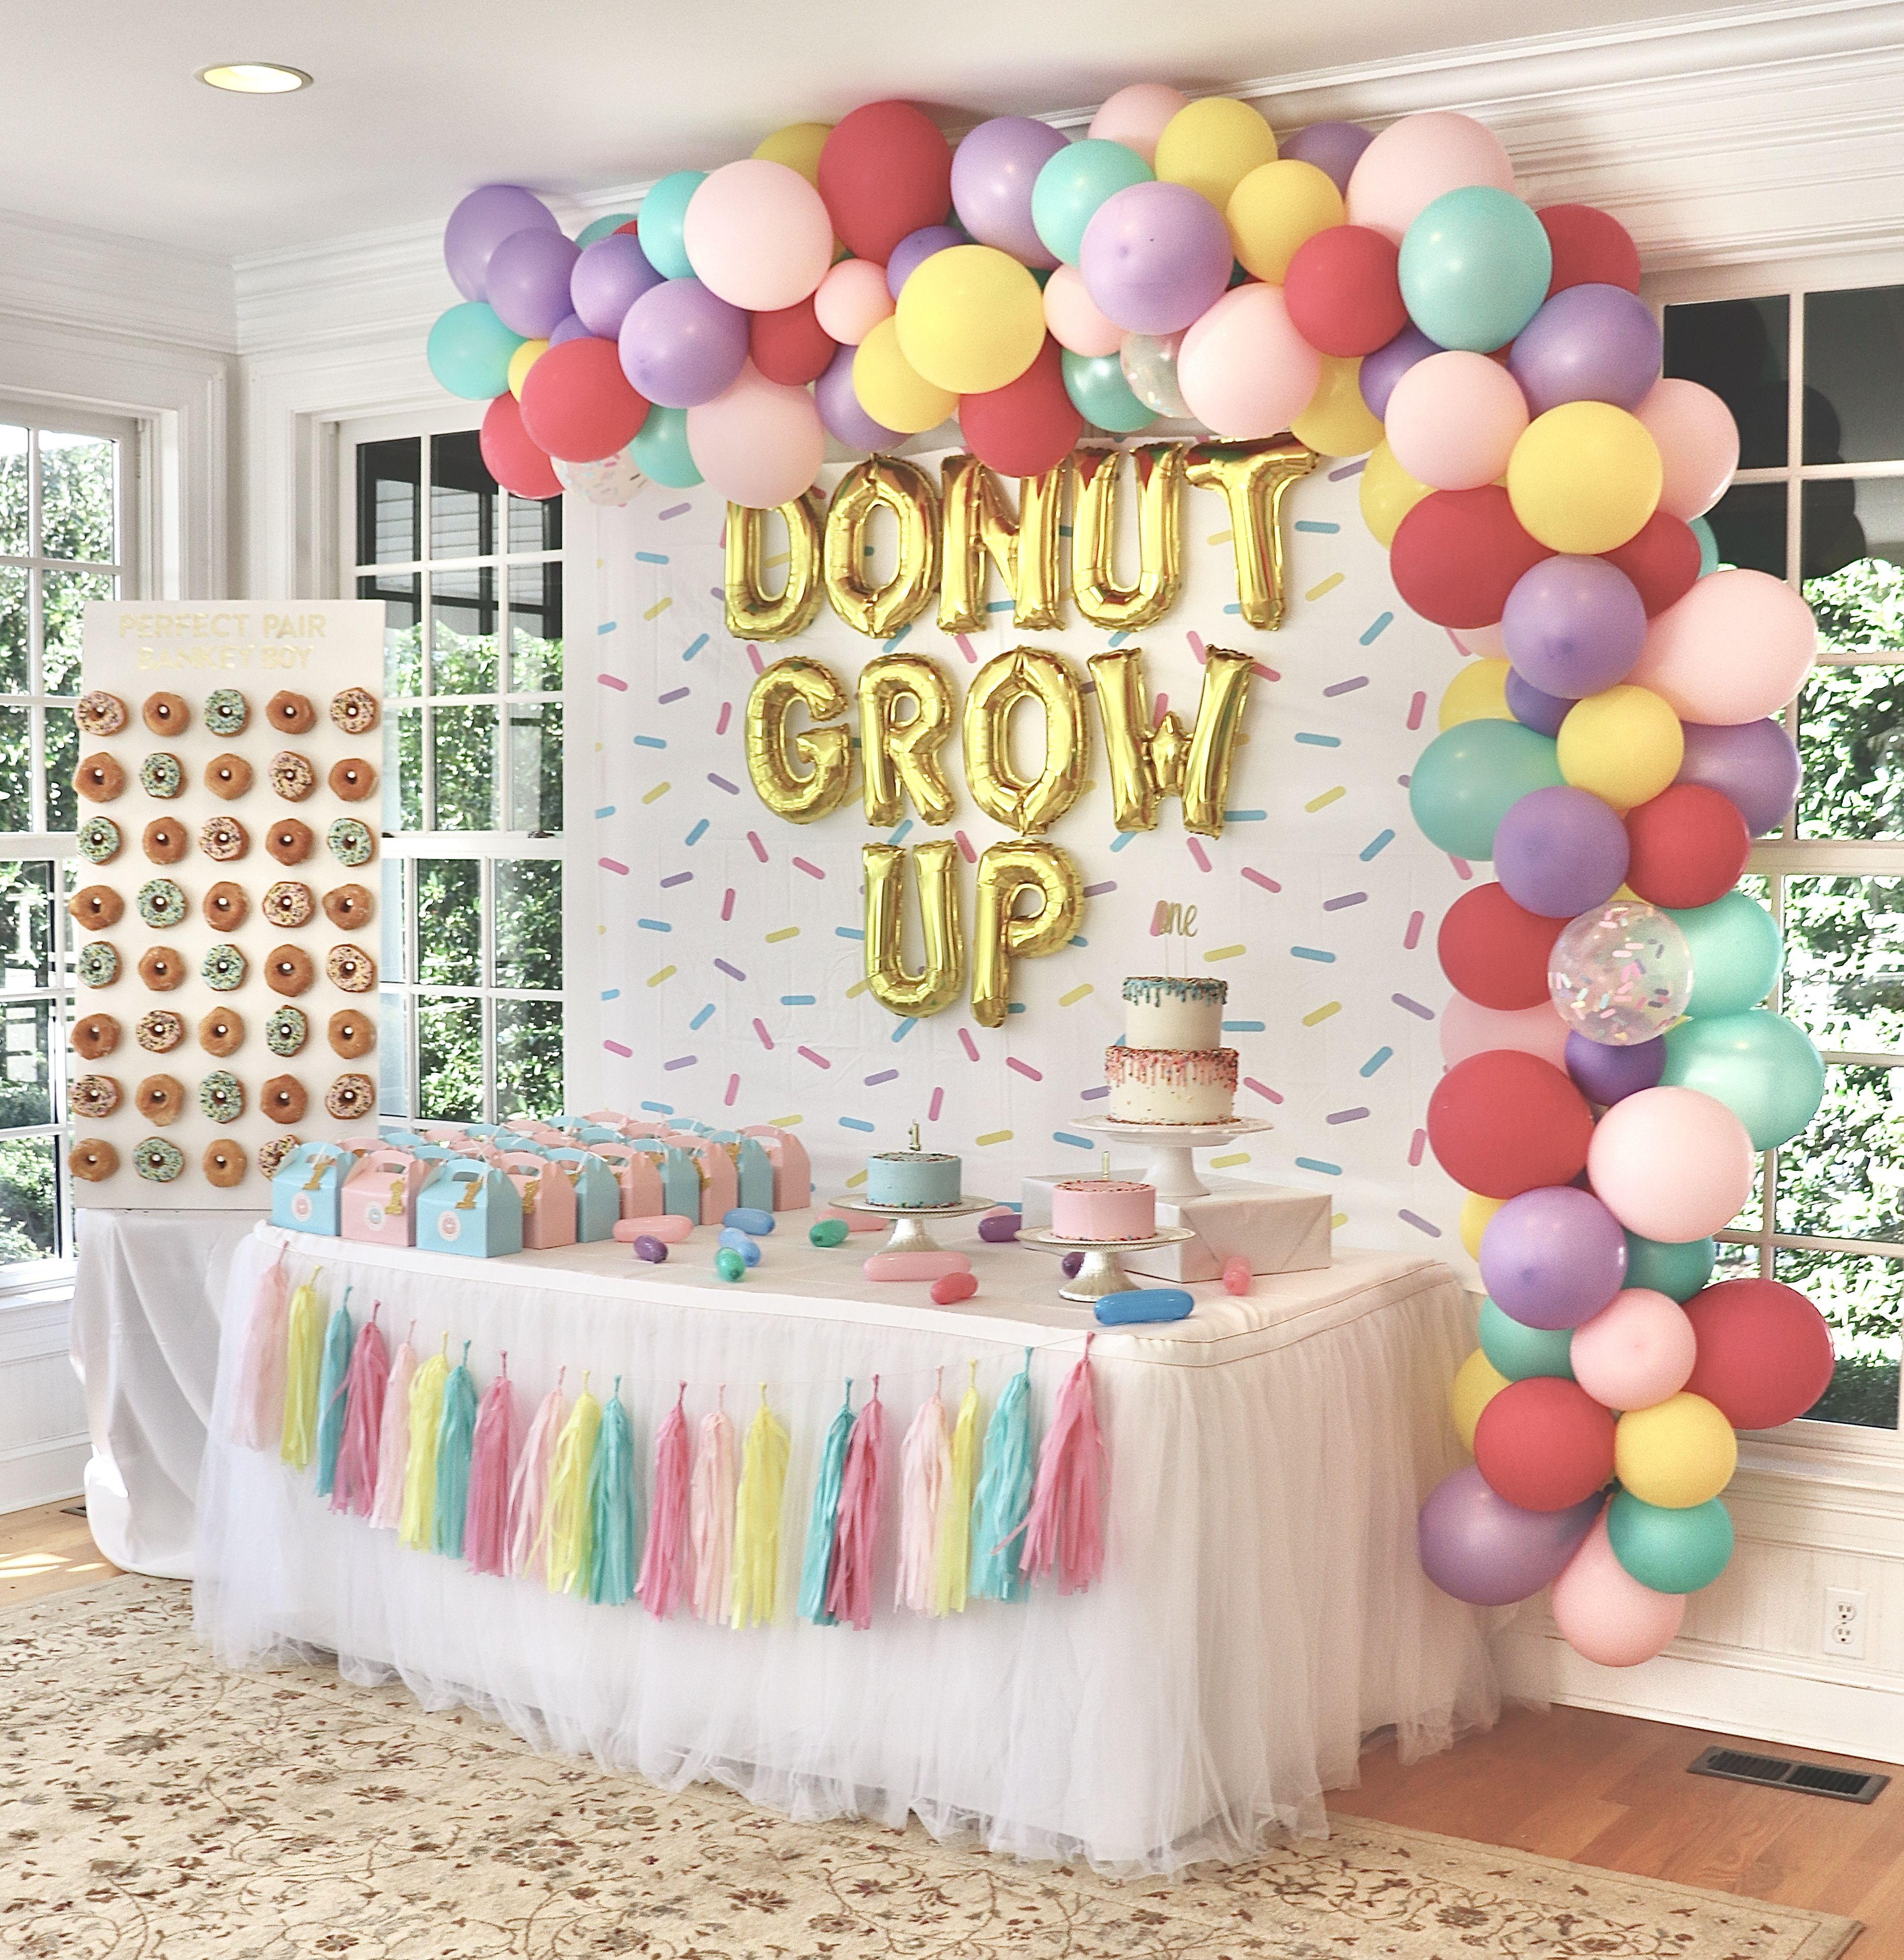 Donut Party Donut Themed Birthday Party Donut Birthday Parties Sprinkles Birthday Party